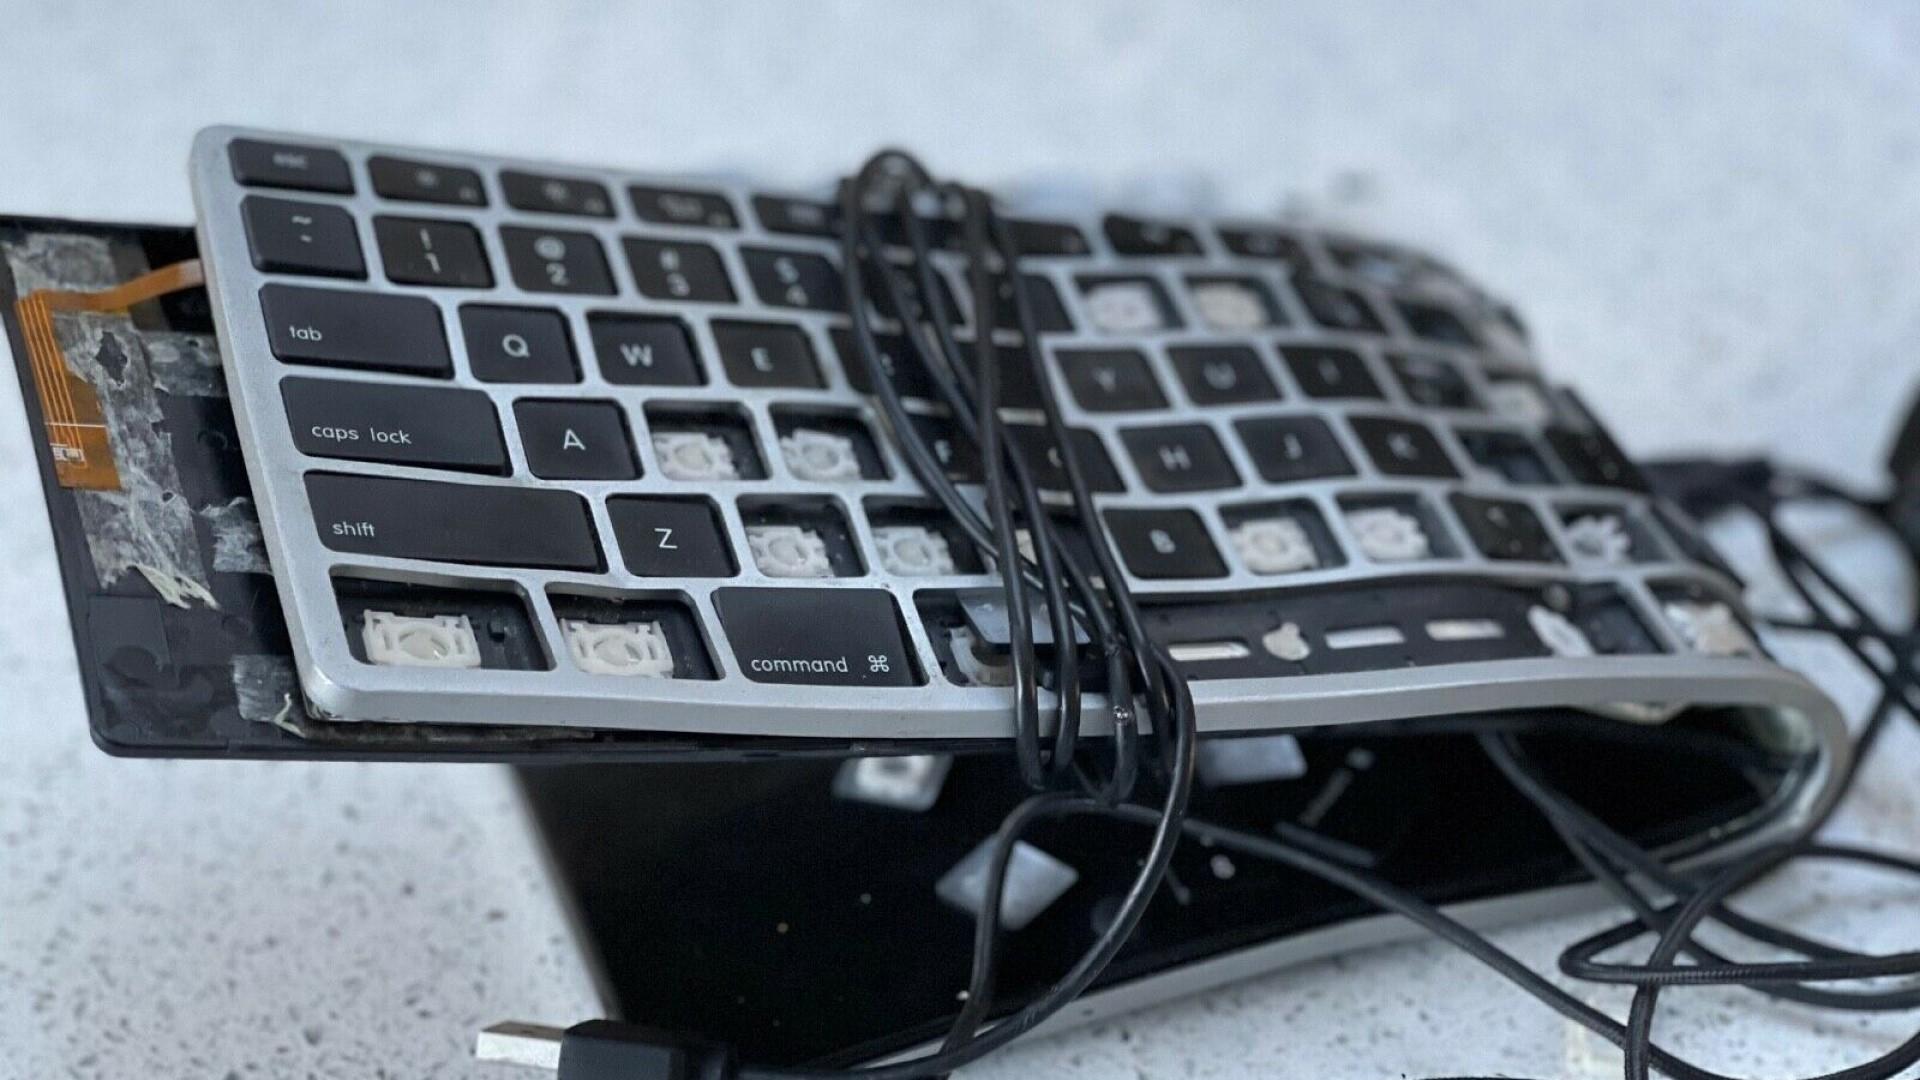 You can buy a keyboard John Romero smashed while ragequitting Quake